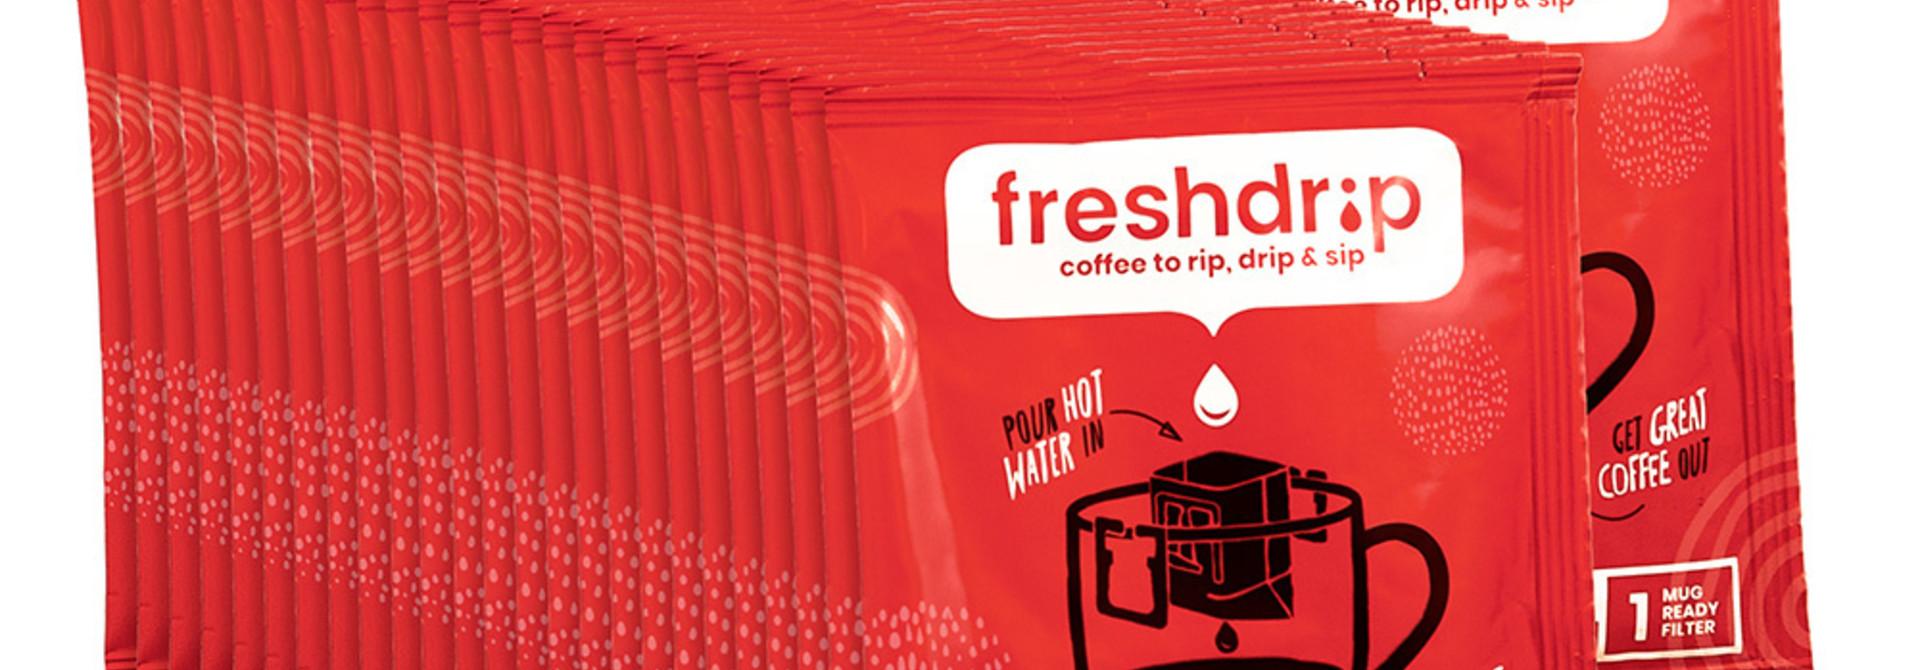 Medium-strength drip coffee | 100 Freshdrip super saver pack